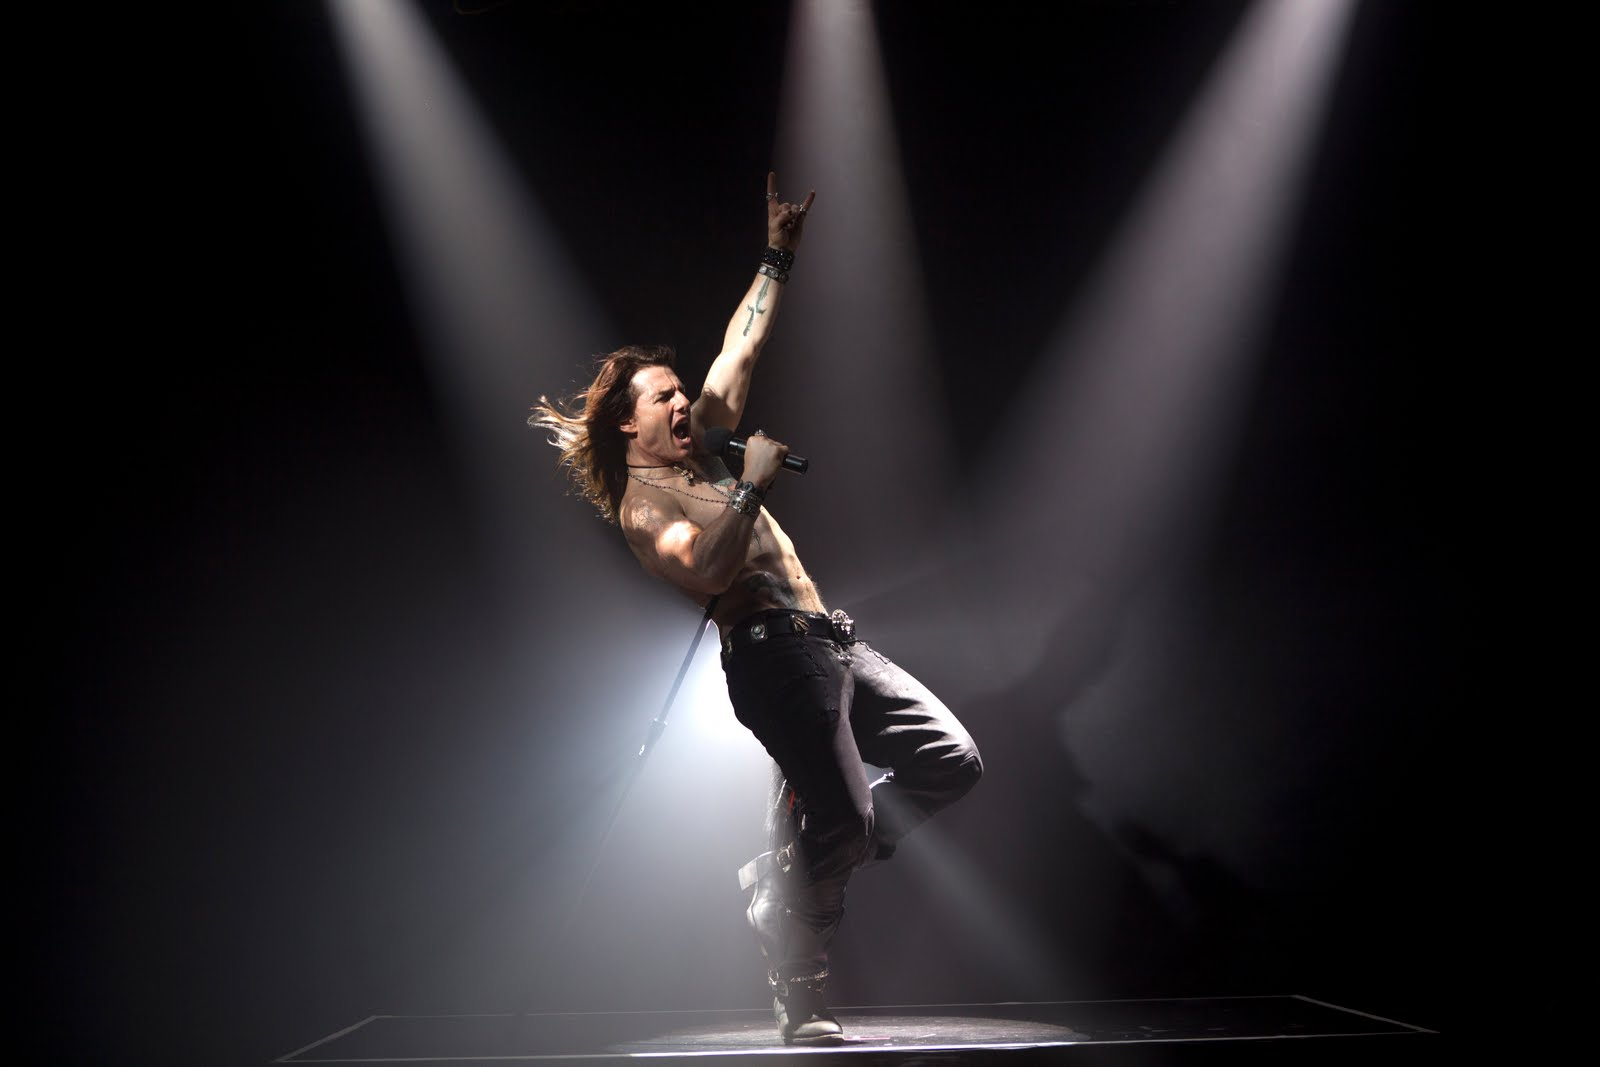 http://3.bp.blogspot.com/-4Fu-AkNYdTQ/T6mzCPb7WII/AAAAAAAABfc/2ShlfScHyqI/s1600/Tom+Cruise+Rock+of+Ages.jpg